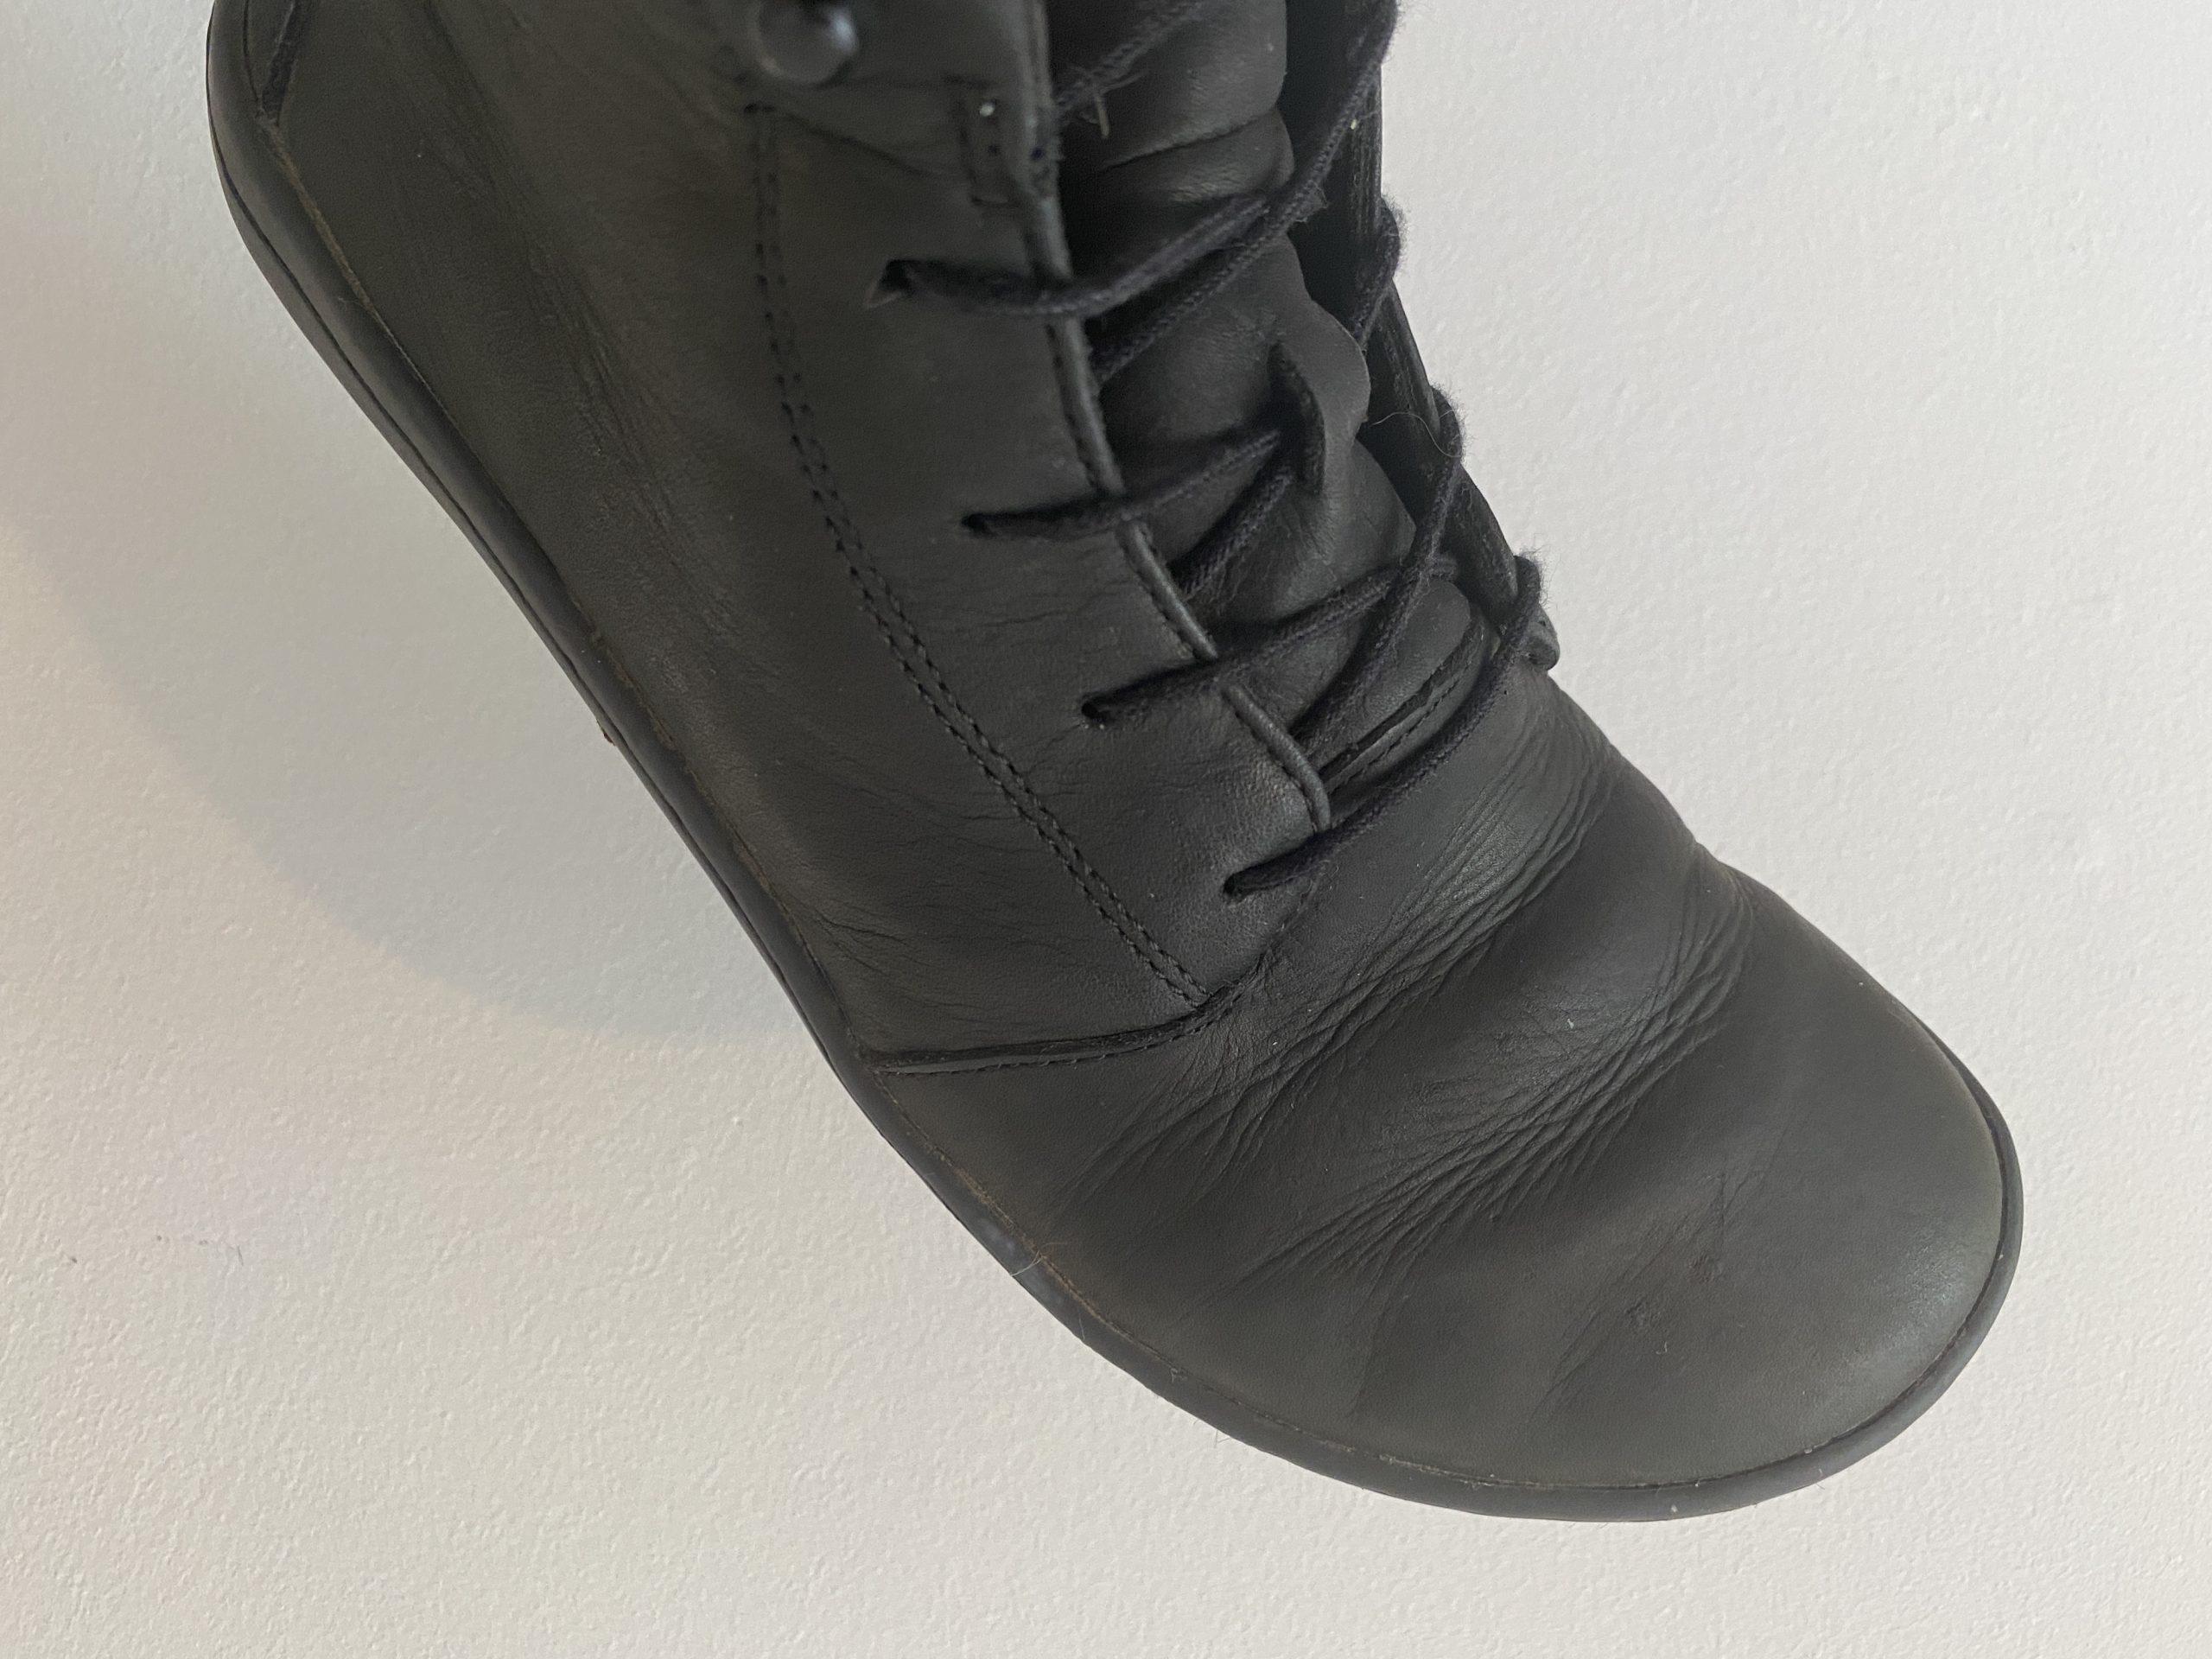 Vivobarefoot Gobi Hi III Shoes Leather Creasing